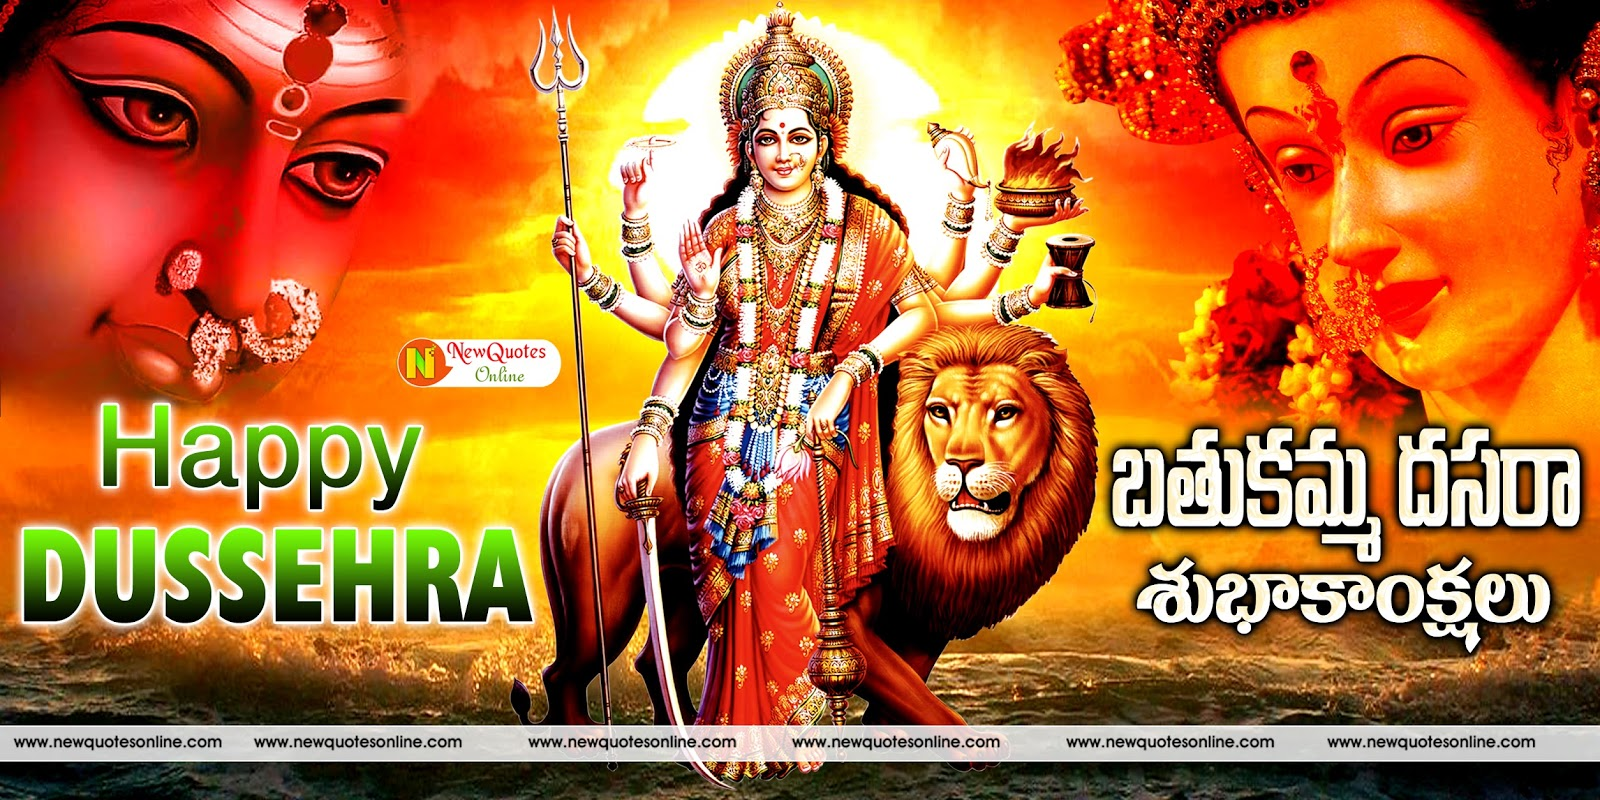 Best vijayadashami greetings dussehra new quotes in telugu new quotes vijayadashami telugu quotes greetings wallpapers happy dasara wishes m4hsunfo